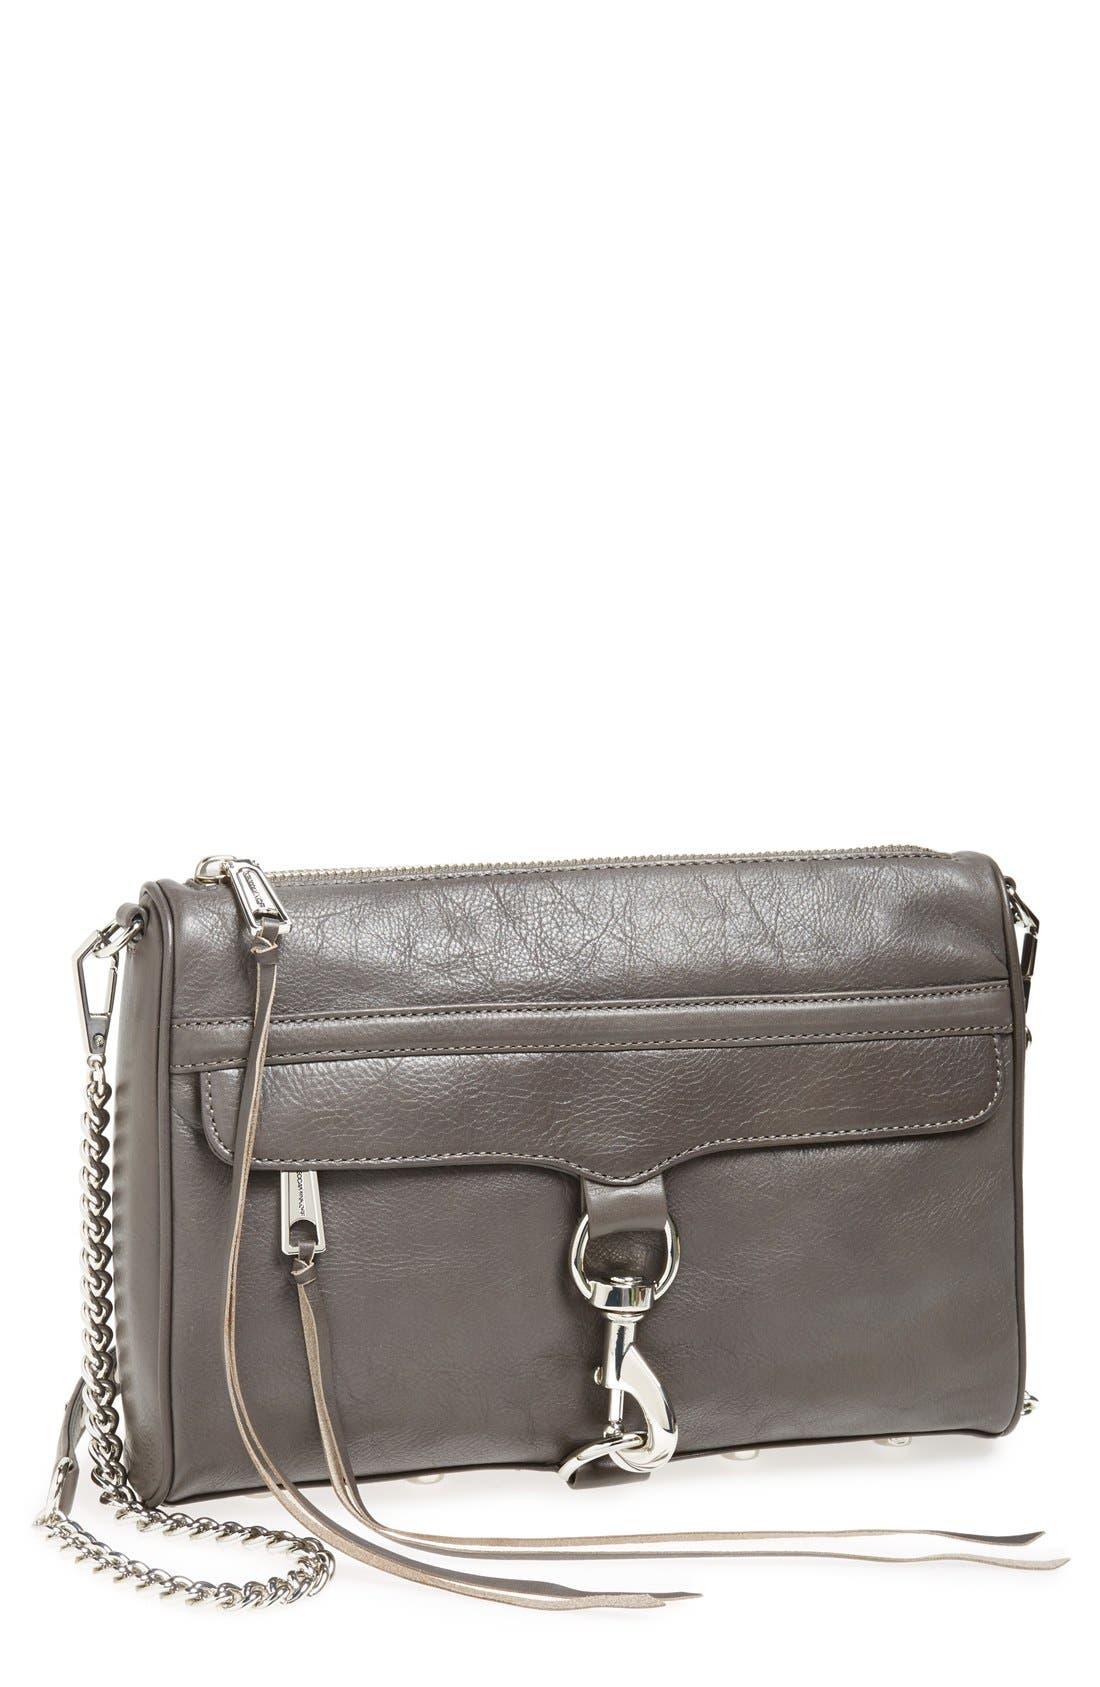 Main Image - Rebecca Minkoff 'MAC' Convertible Crossbody Bag